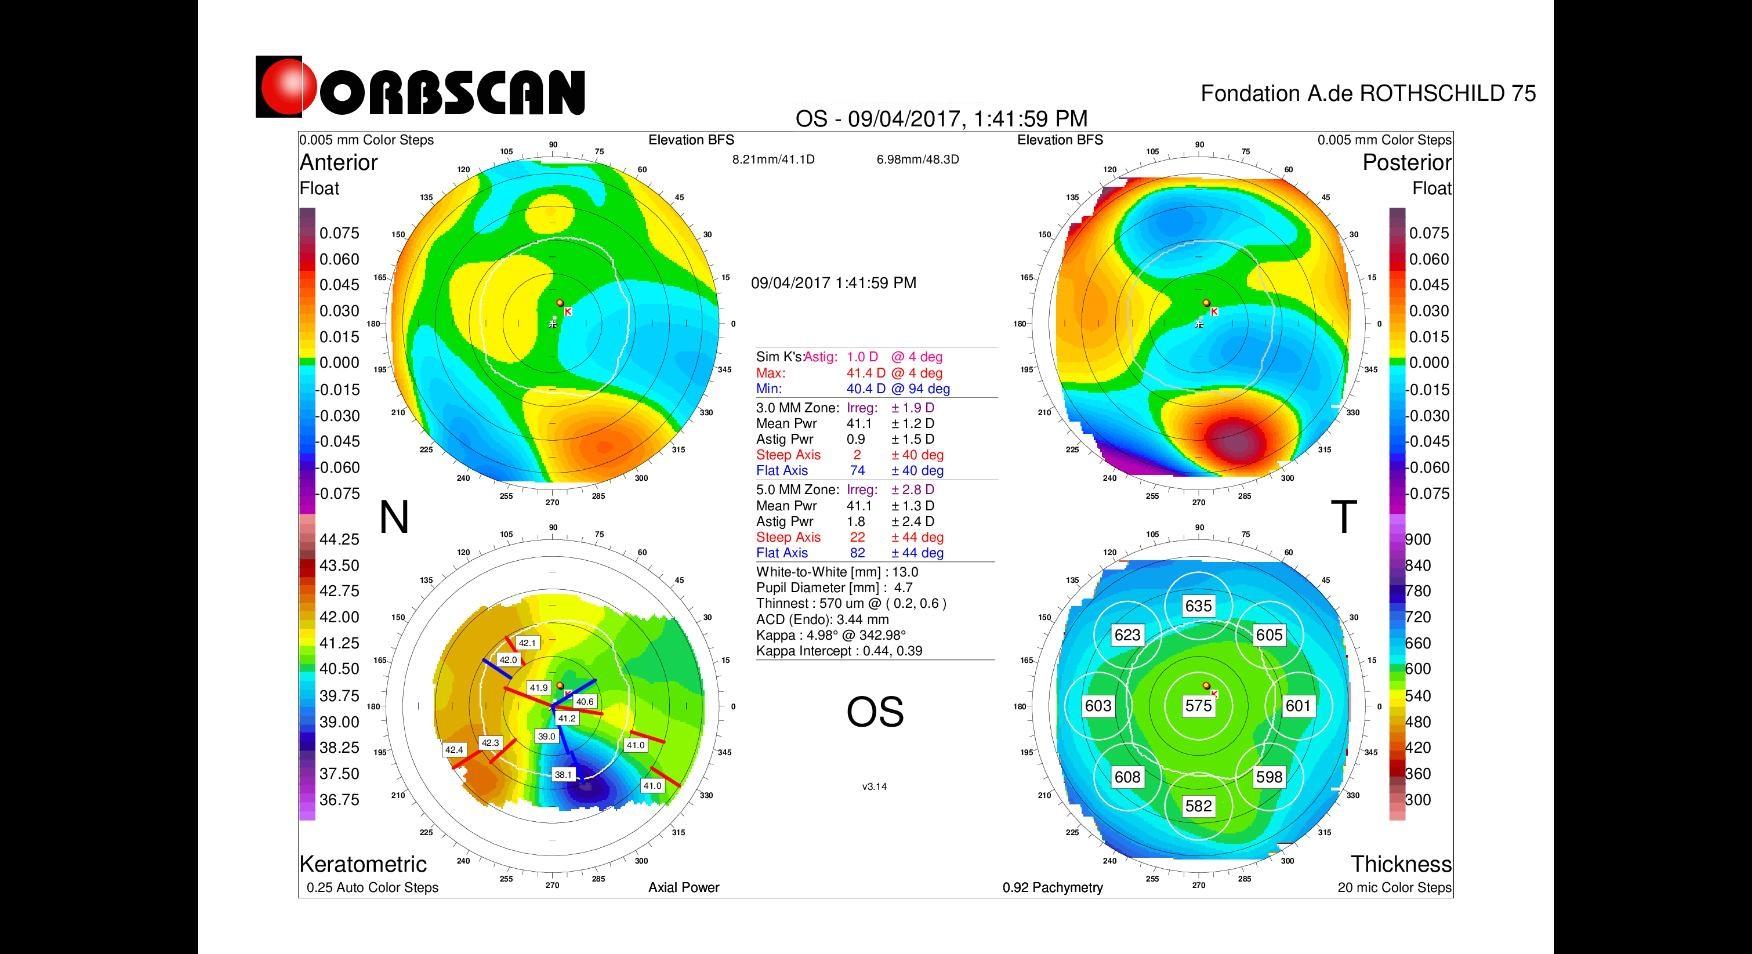 Orbscan map pellucid marginal degeneration PMD